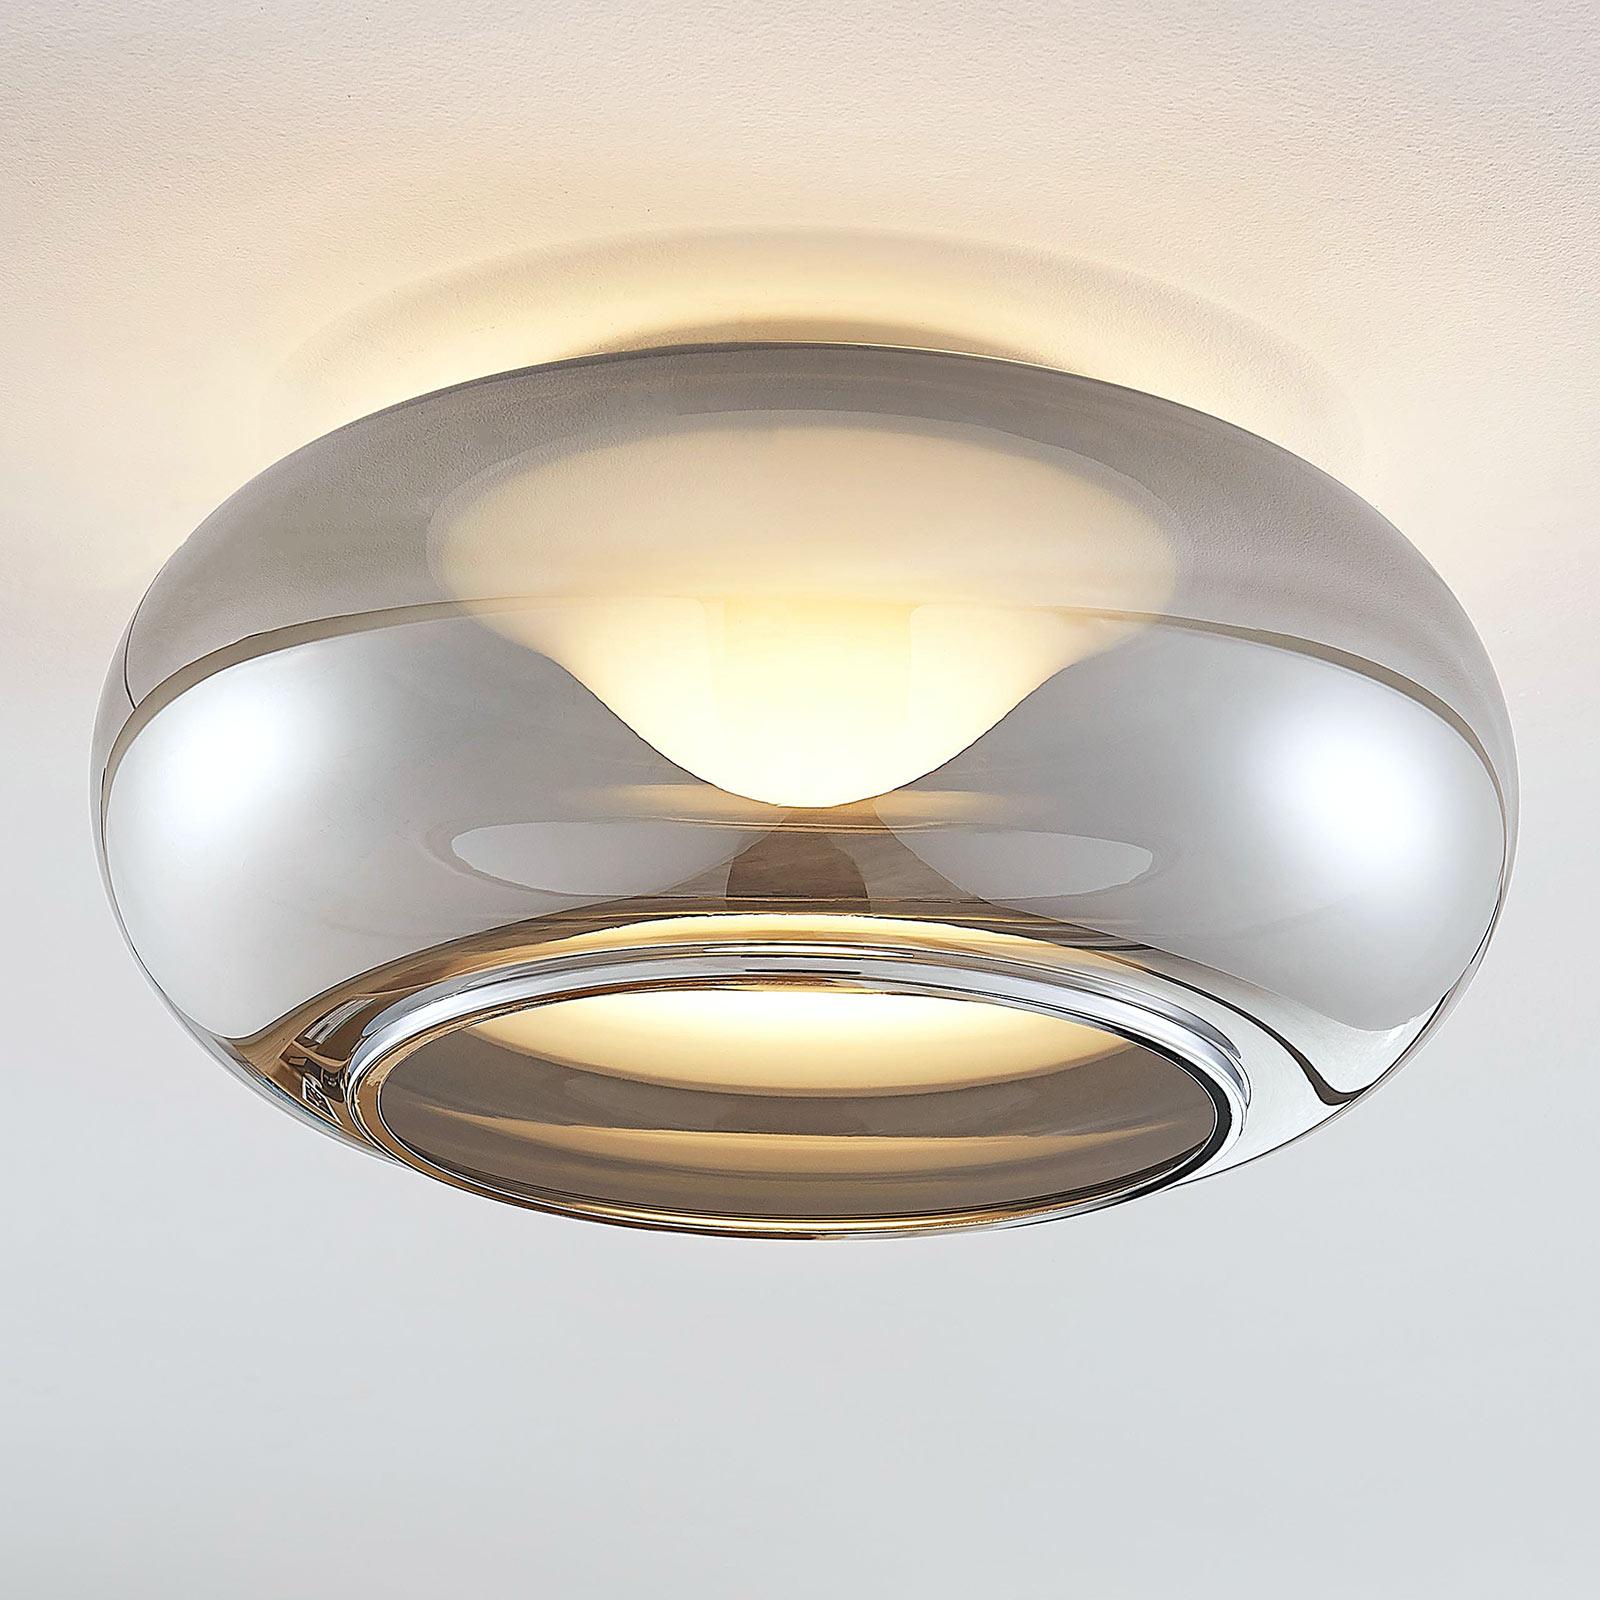 Glazen LED plafondlamp Mijo in rookgrijs